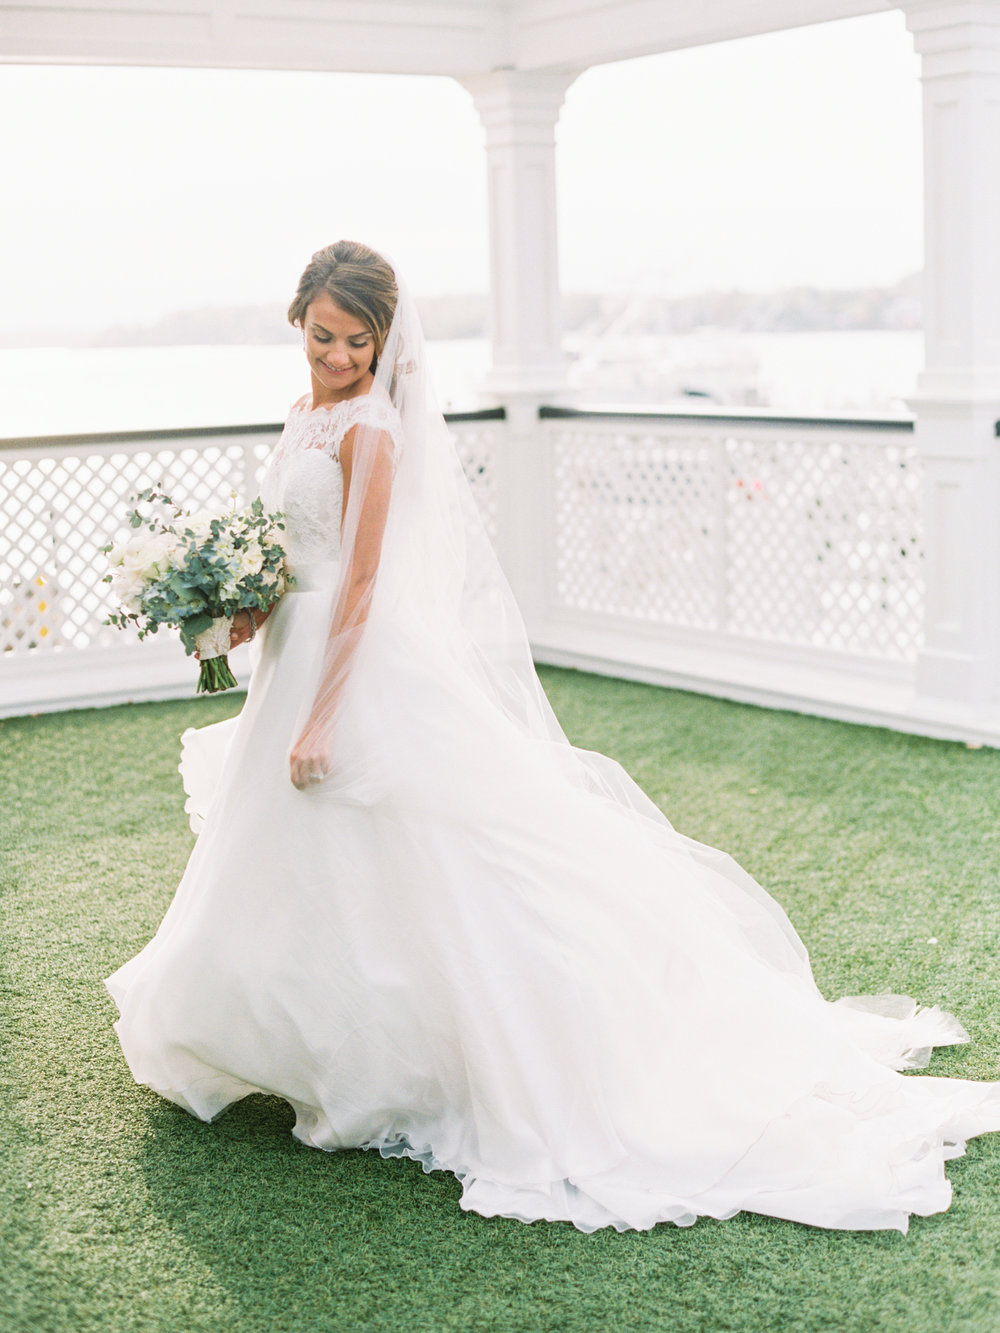 brianne&david_5.12.18_wedding-400.JPG